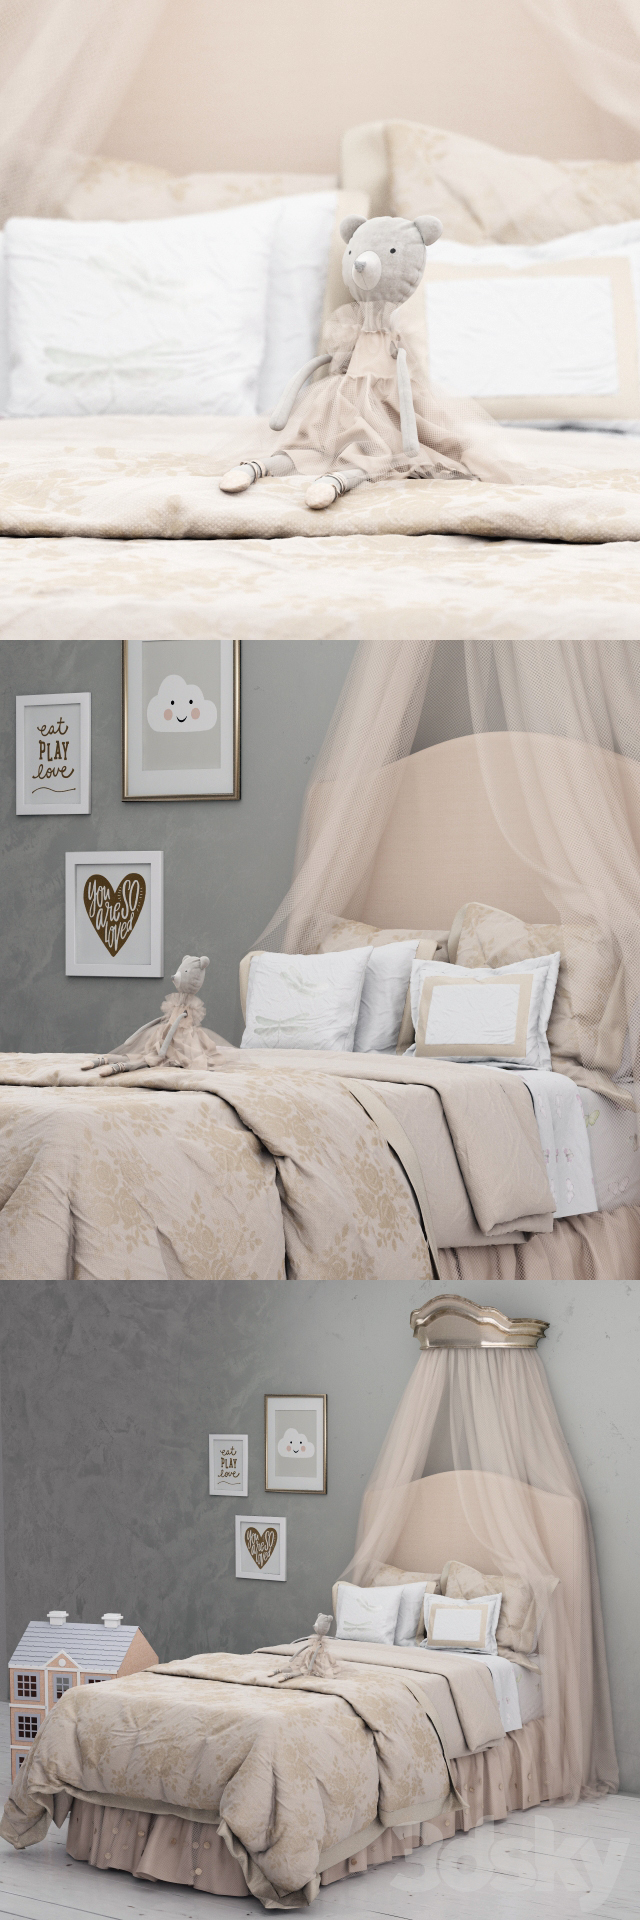 Monique Lhuillier Upholstered Camelback Bed, Pottery Barn Kids